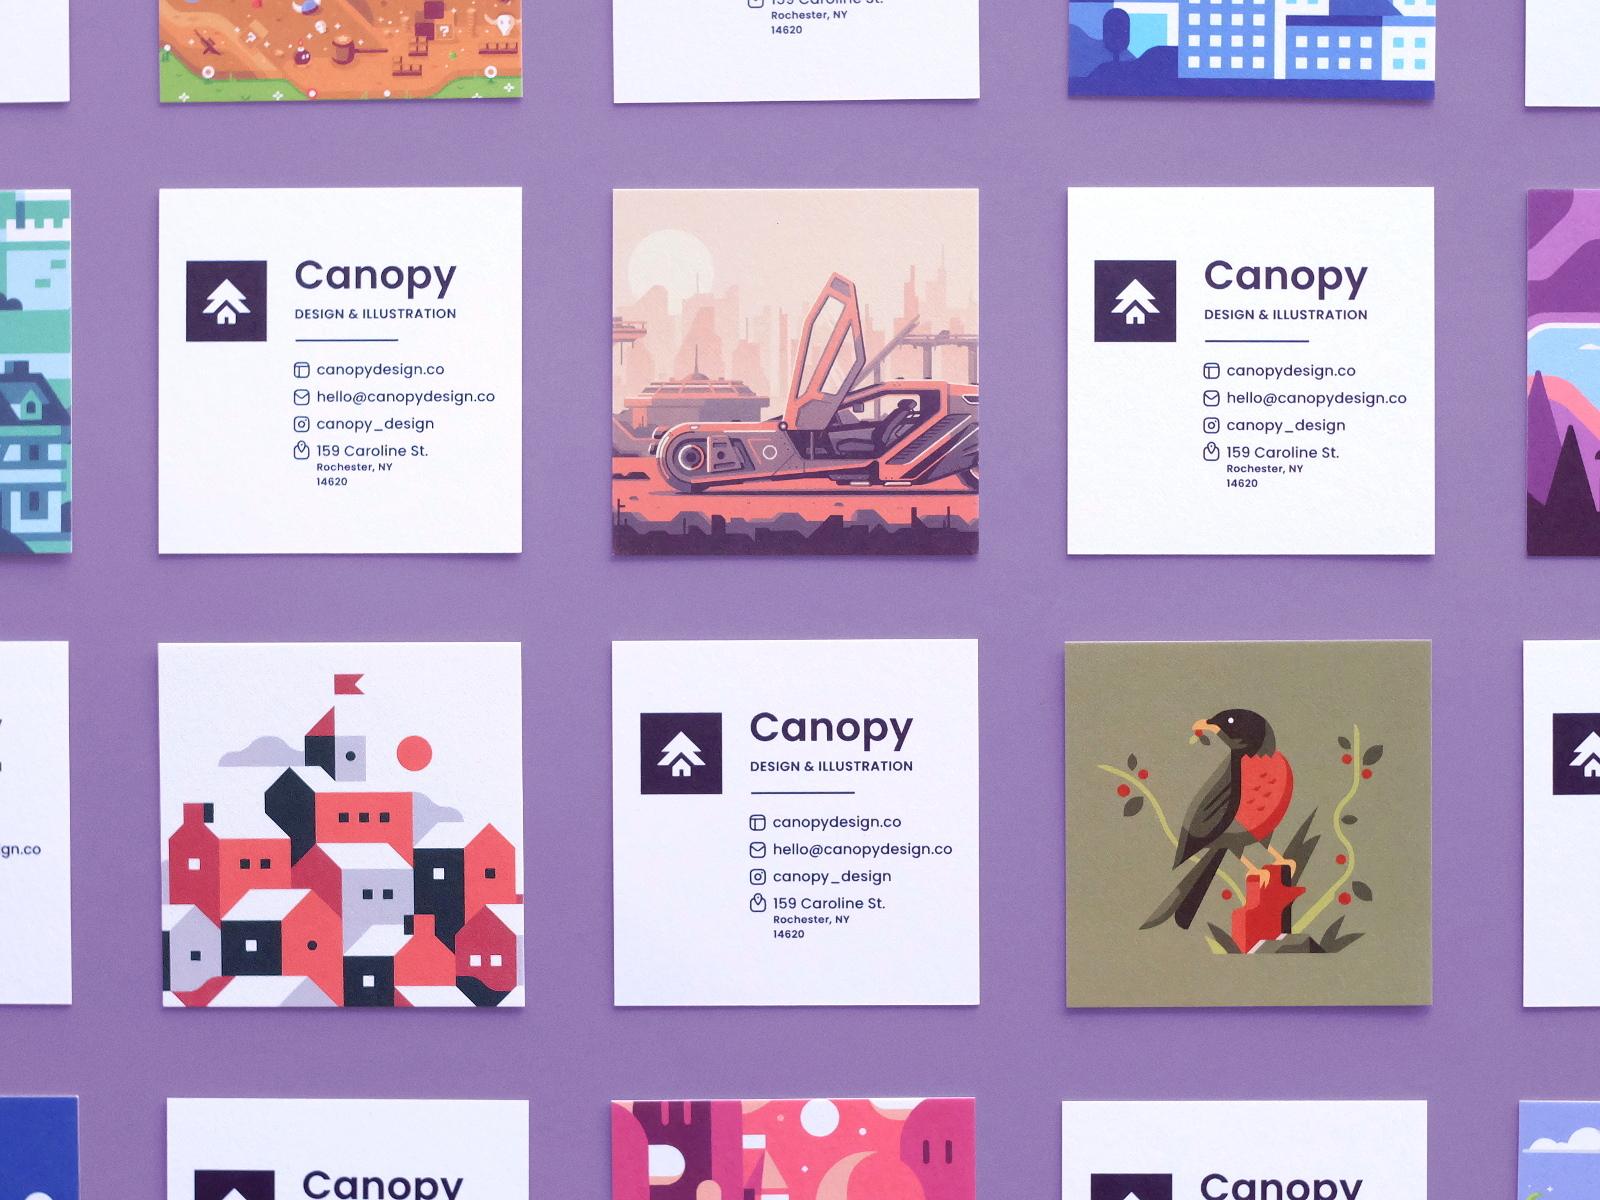 canopy-card-mockup-dribbble.jpg